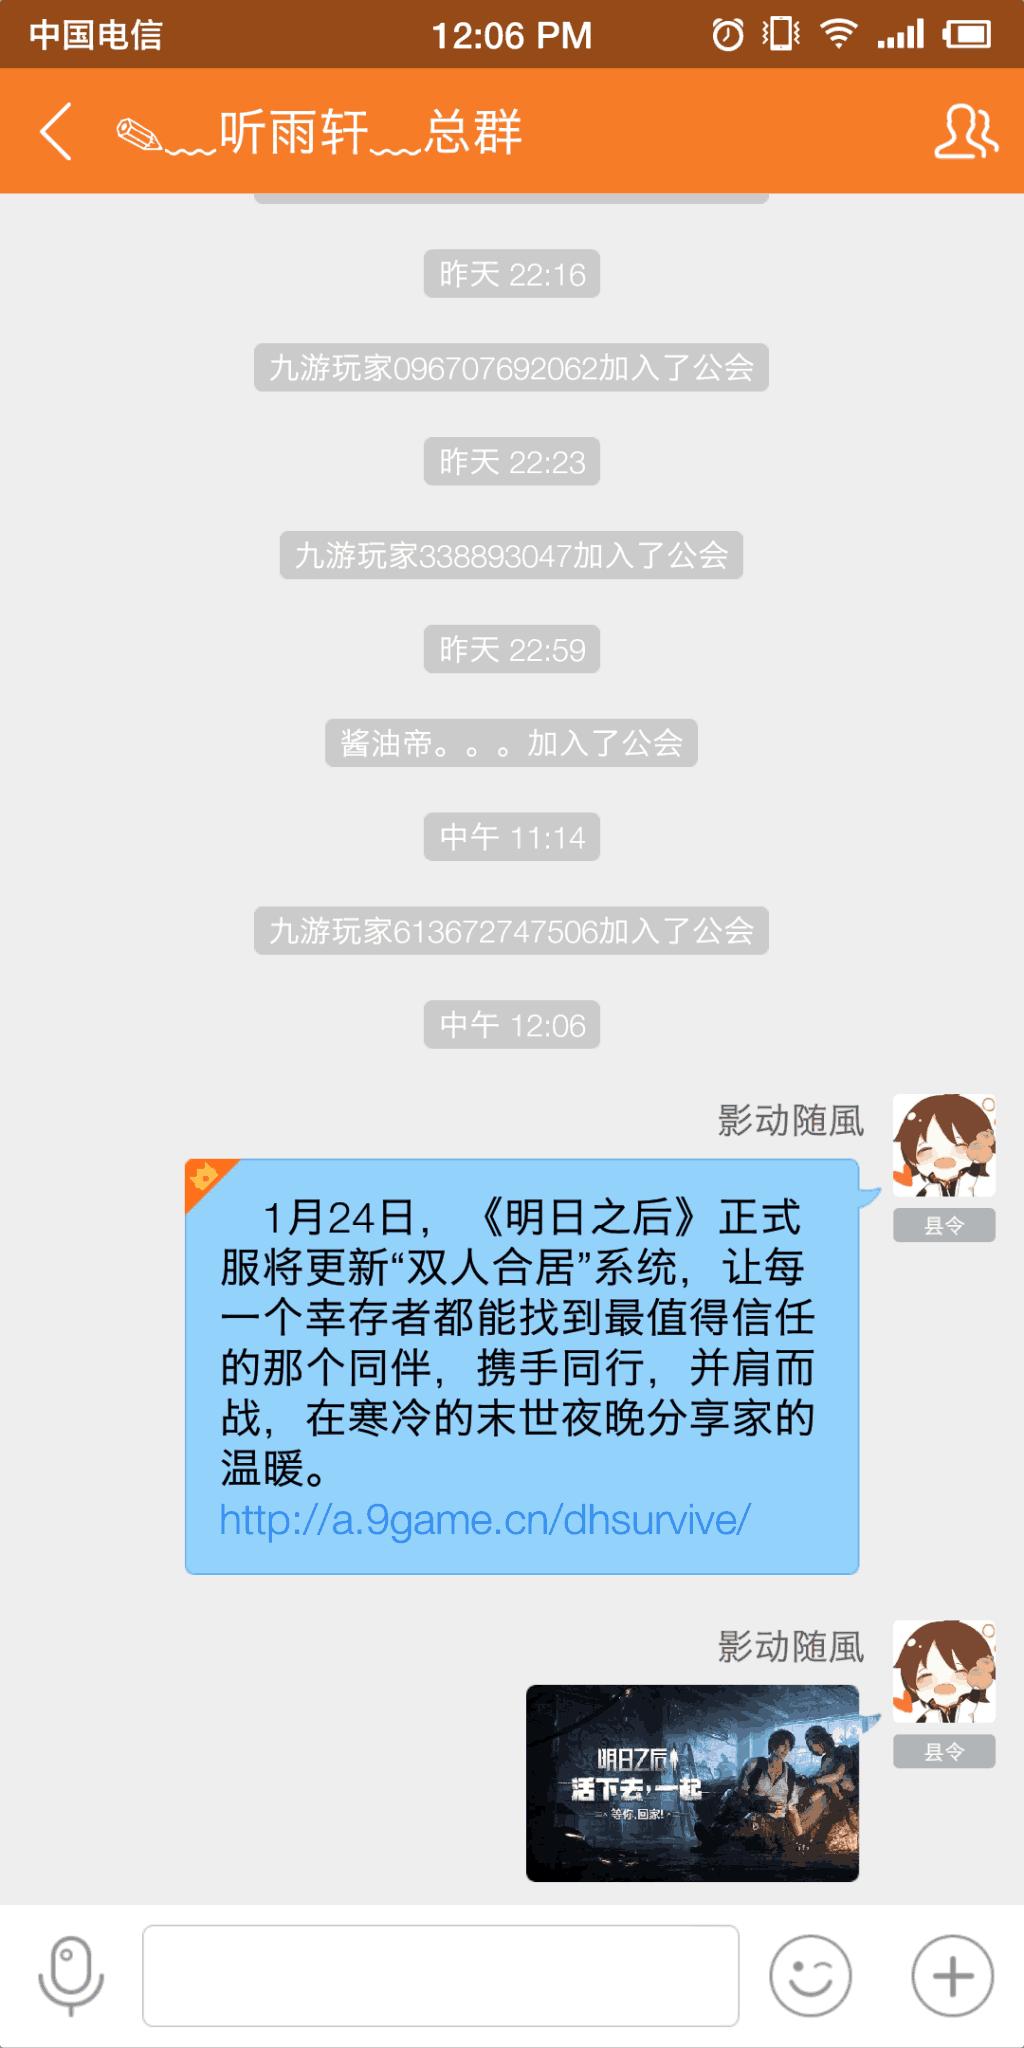 Screenshot_2019s01s18s12s06s35s580_九游.png